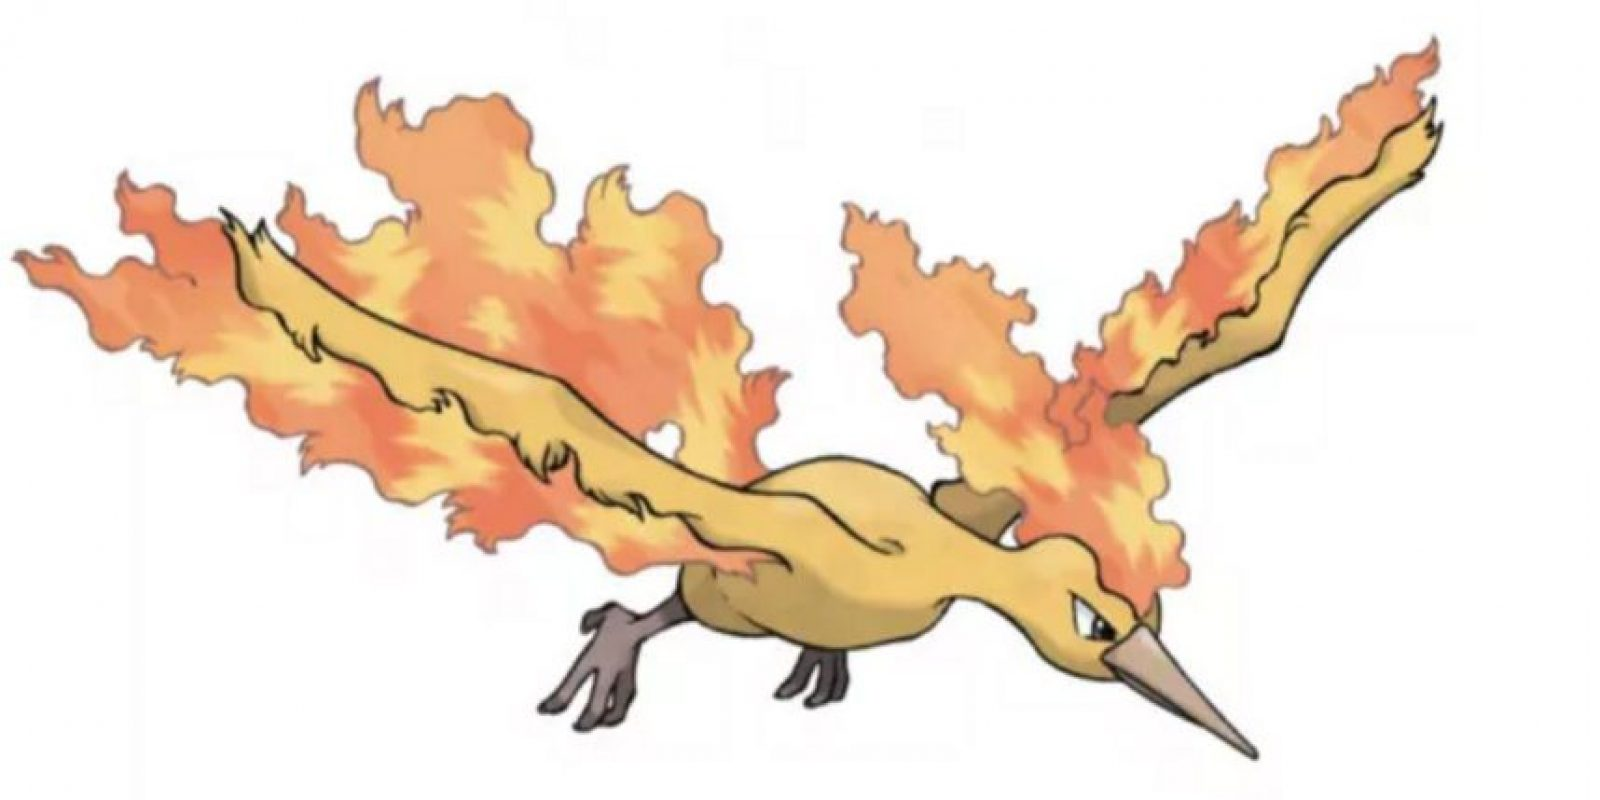 Él es Moltres. Foto:Pokémon